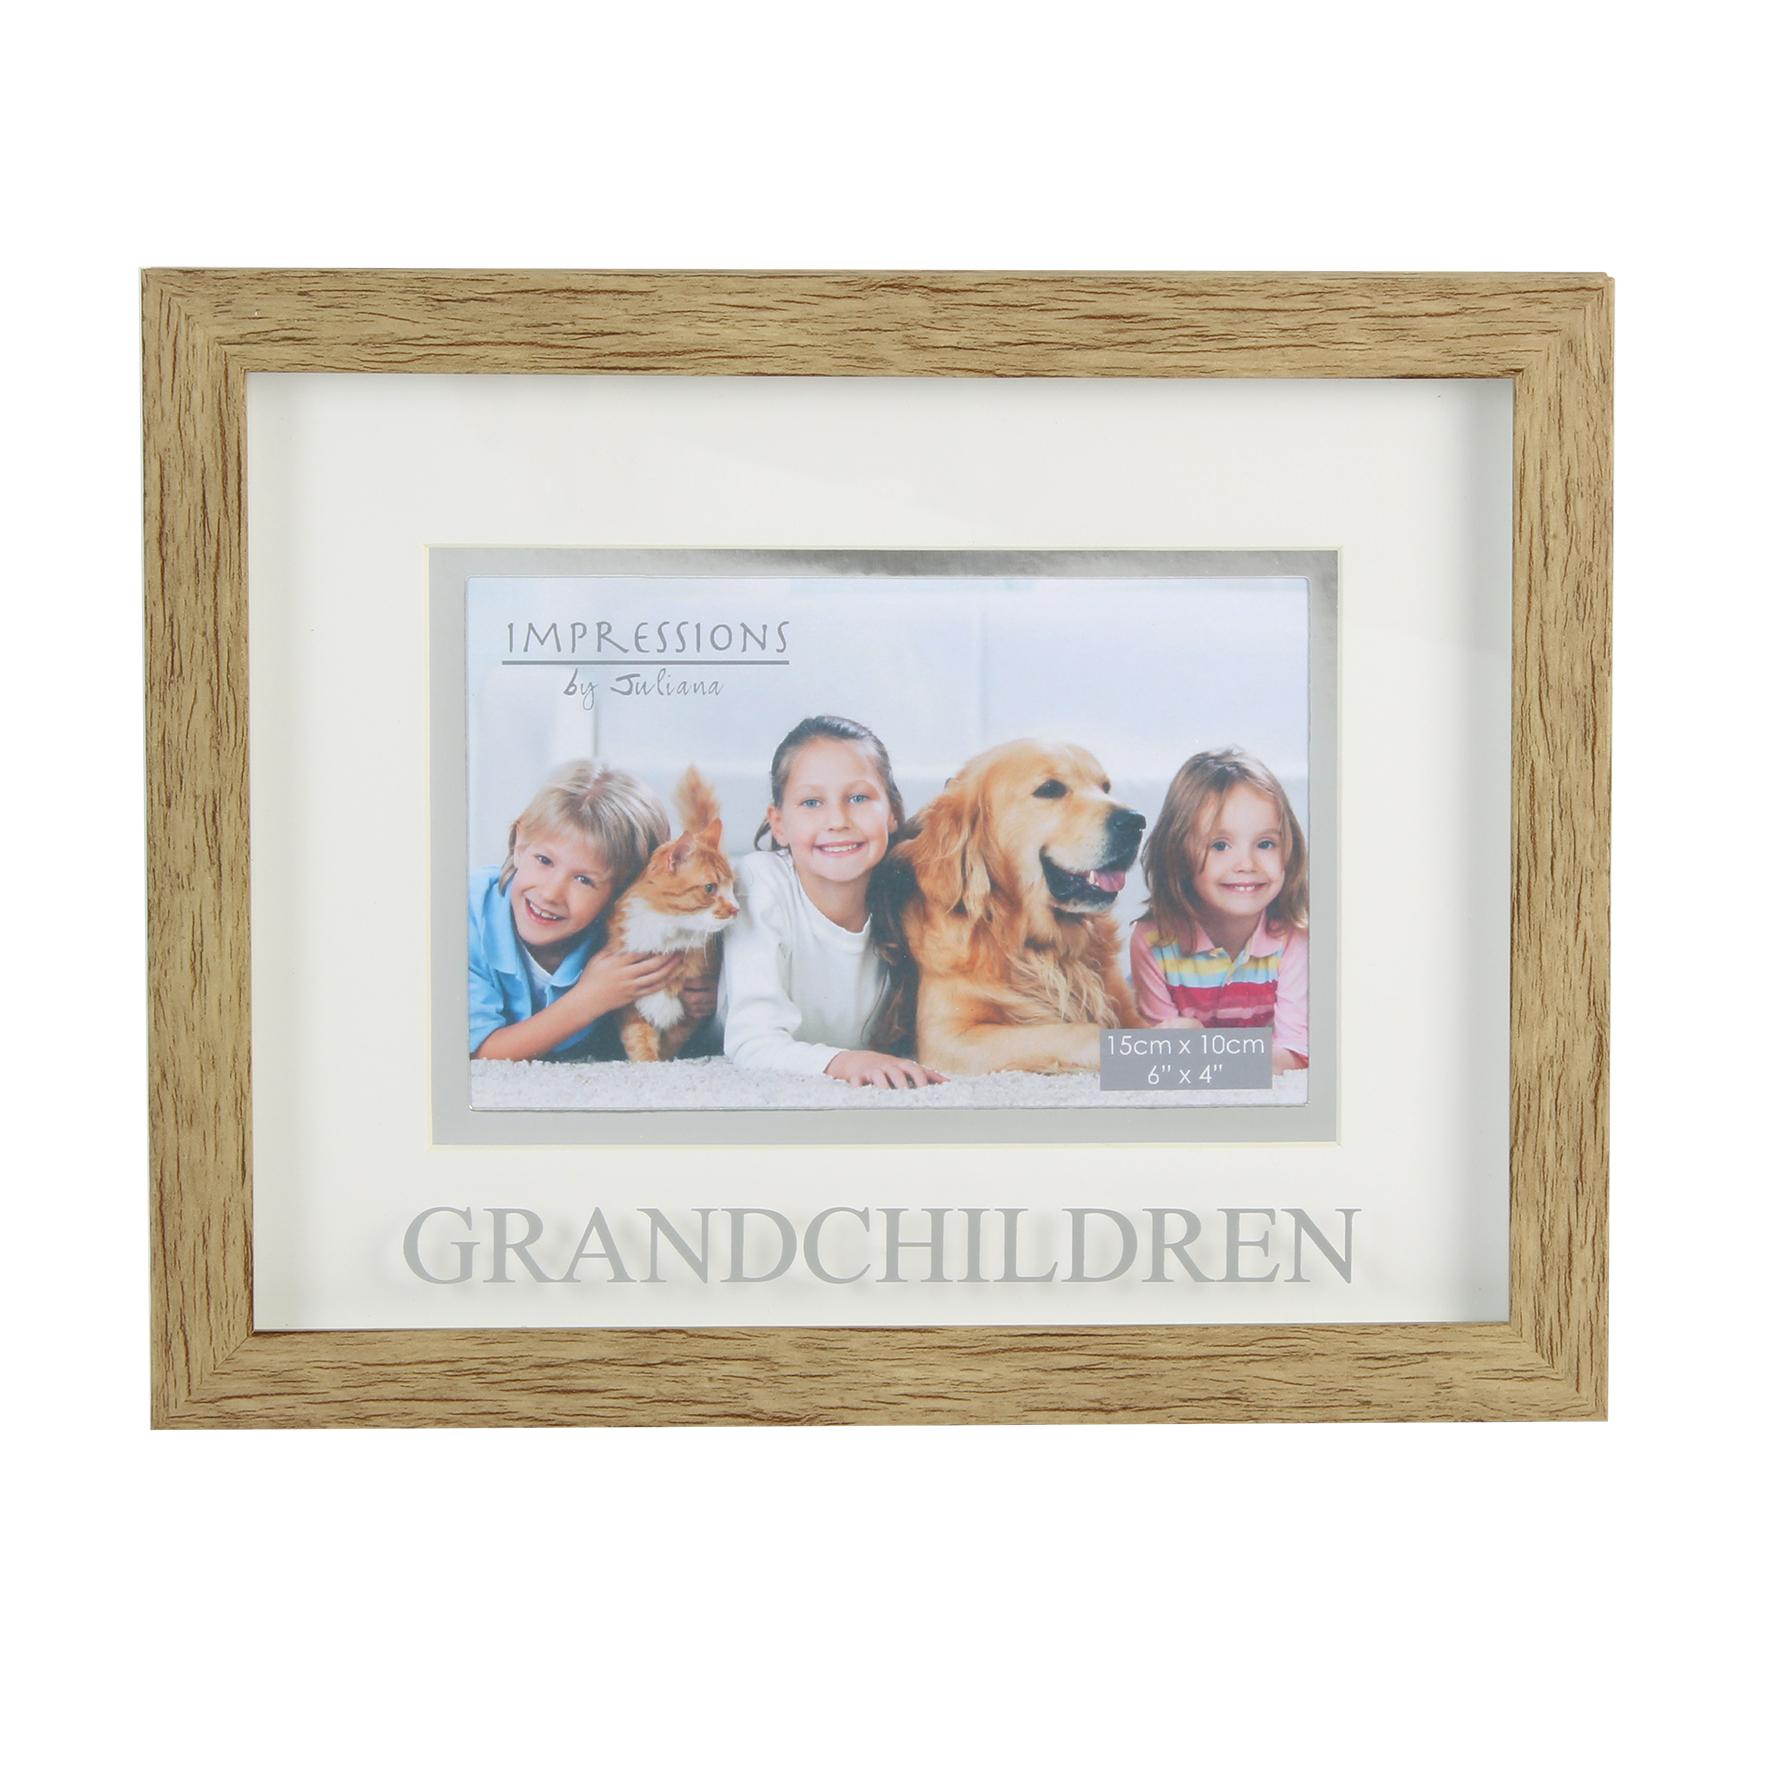 Juliana Grandchildren Natural Wood Effect Photo Frame | Gifts